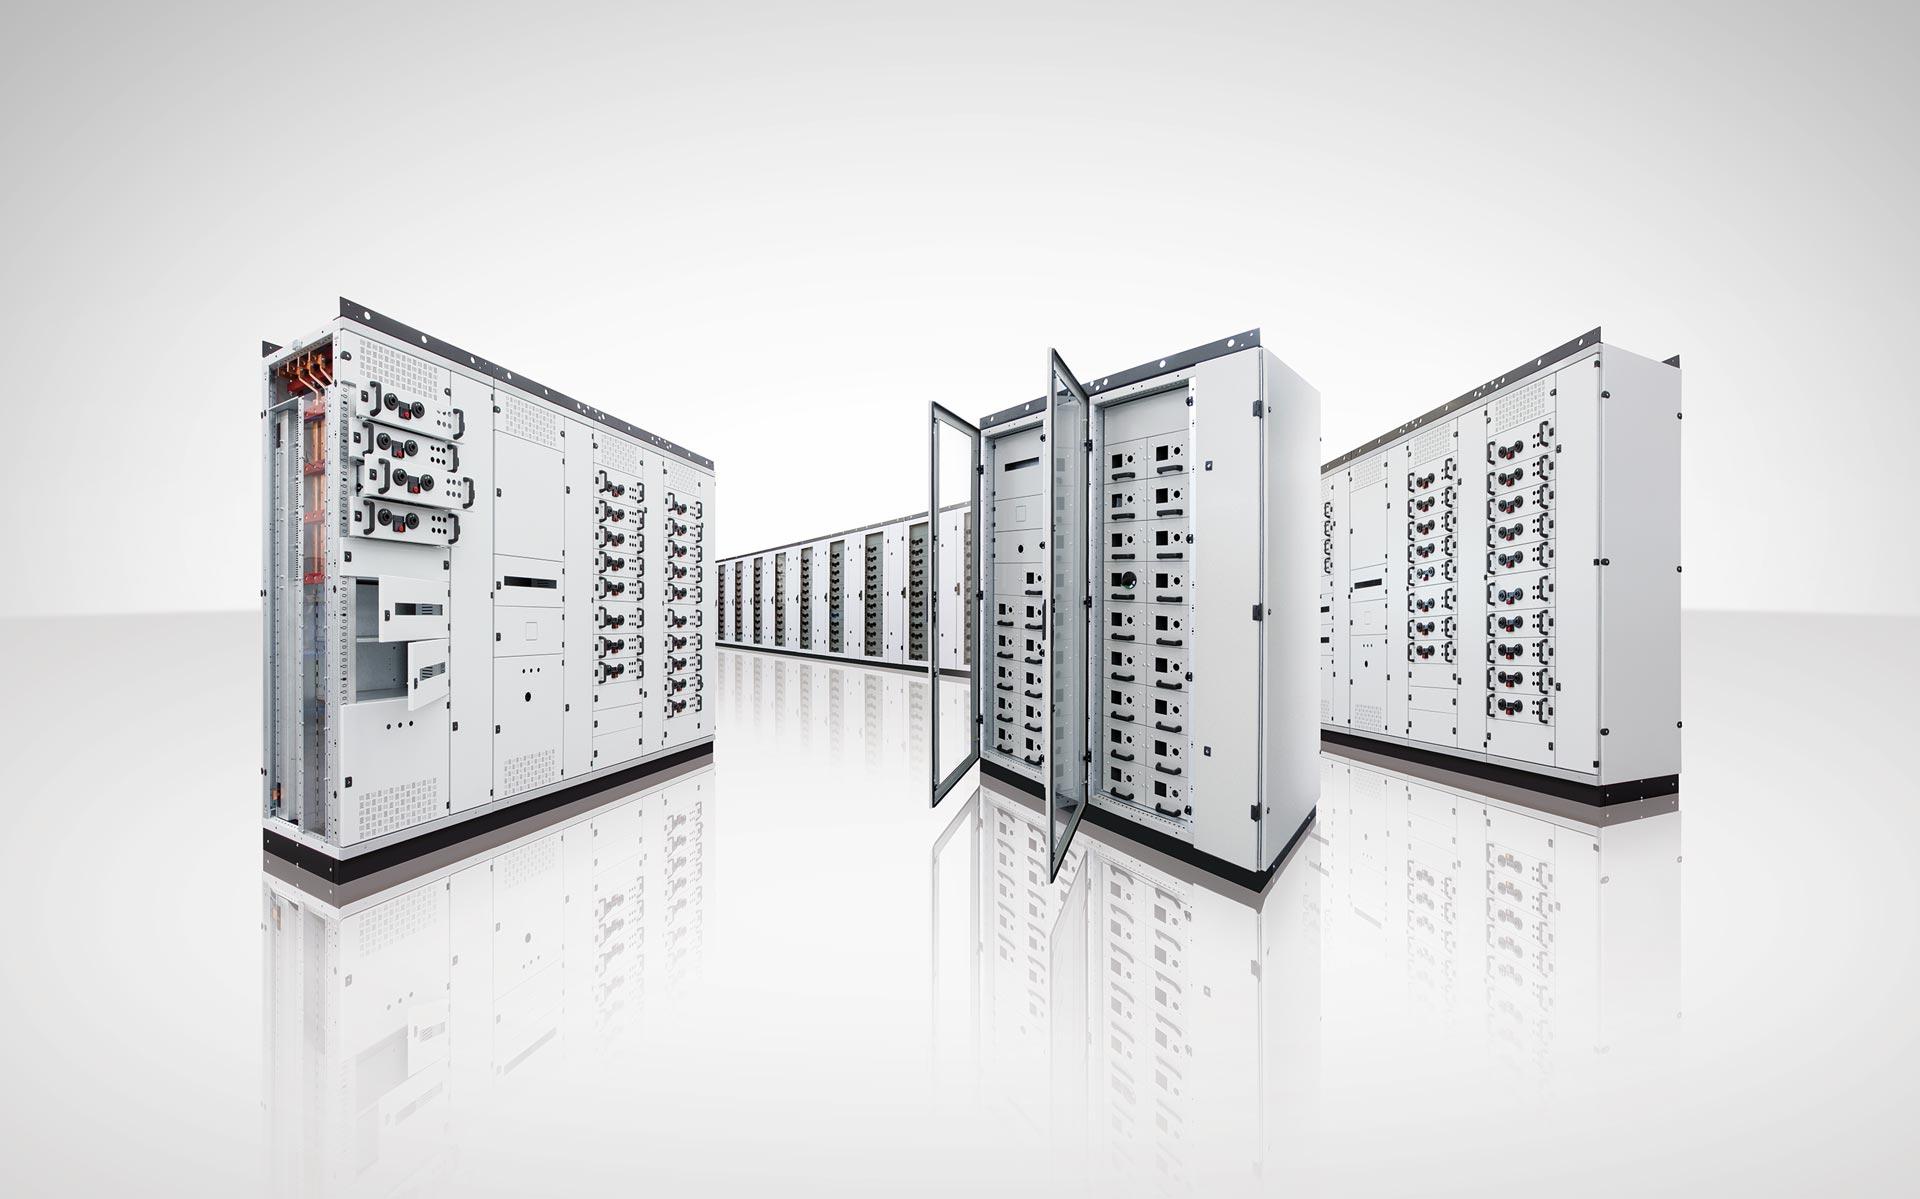 Schemi Quadri Elettrici Industriali : Me cub lafer armadi per quadri elettrici a cassetti fissi fino a